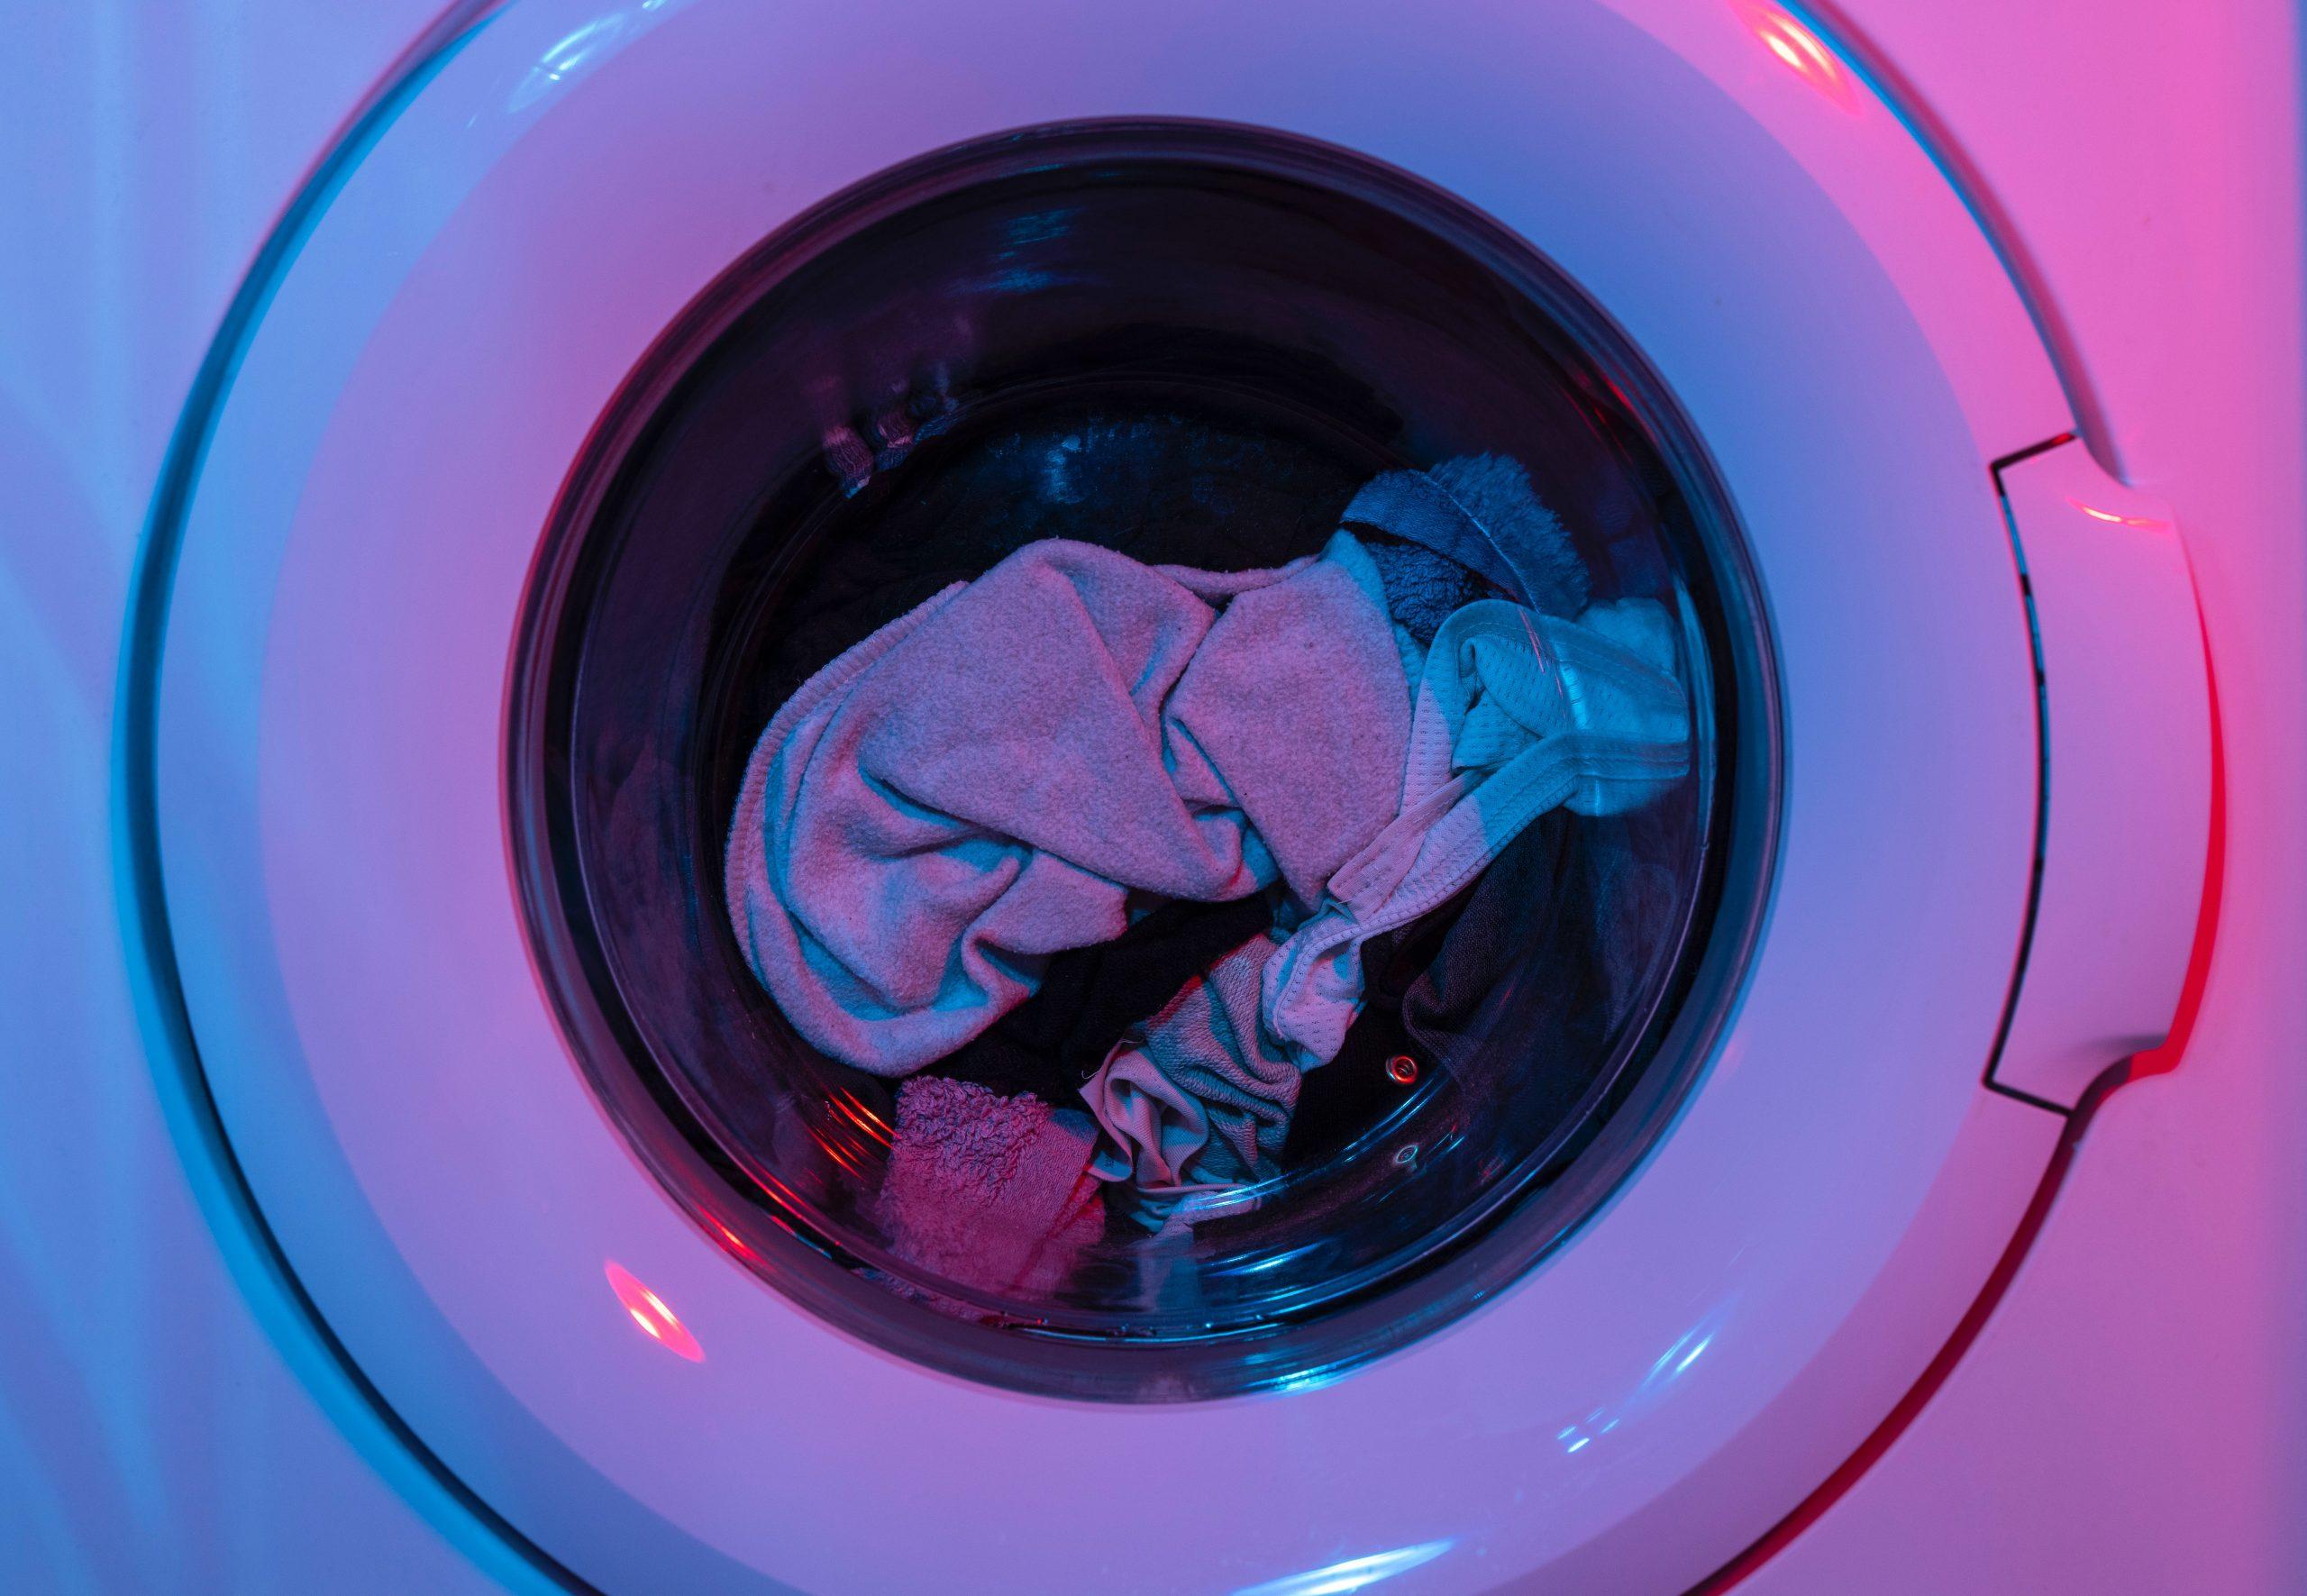 Imagen de ropa en secadora con luz morada